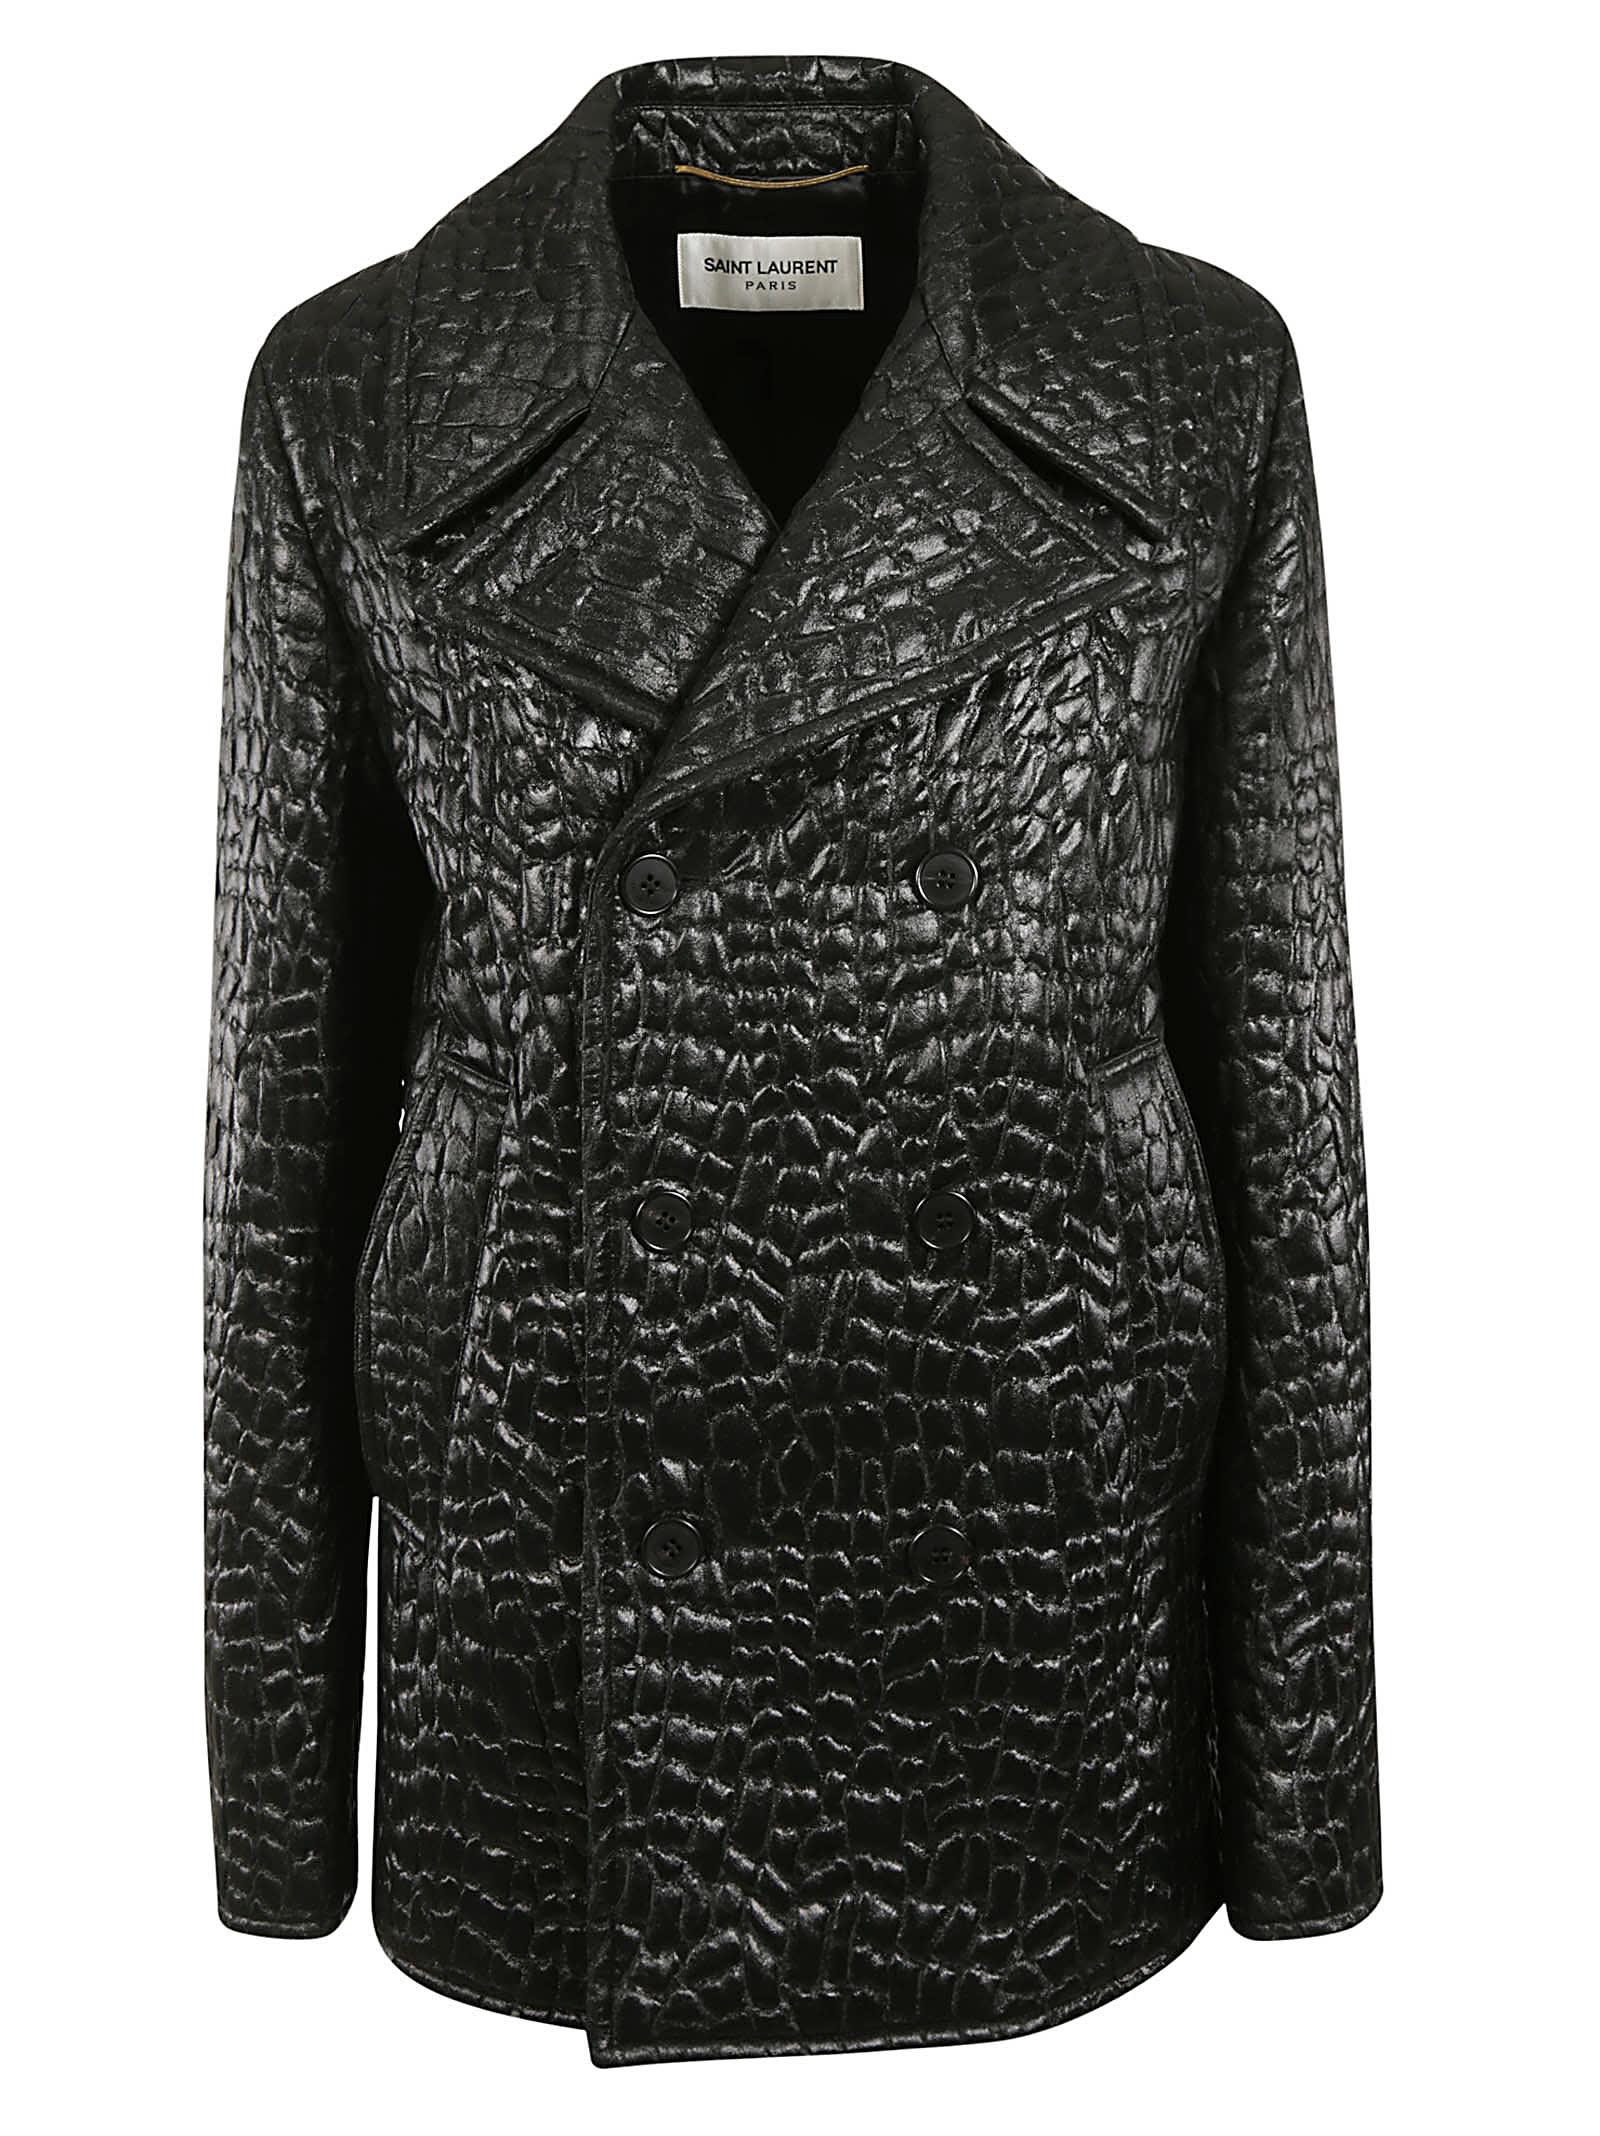 Saint Laurent Double Breasted Coat